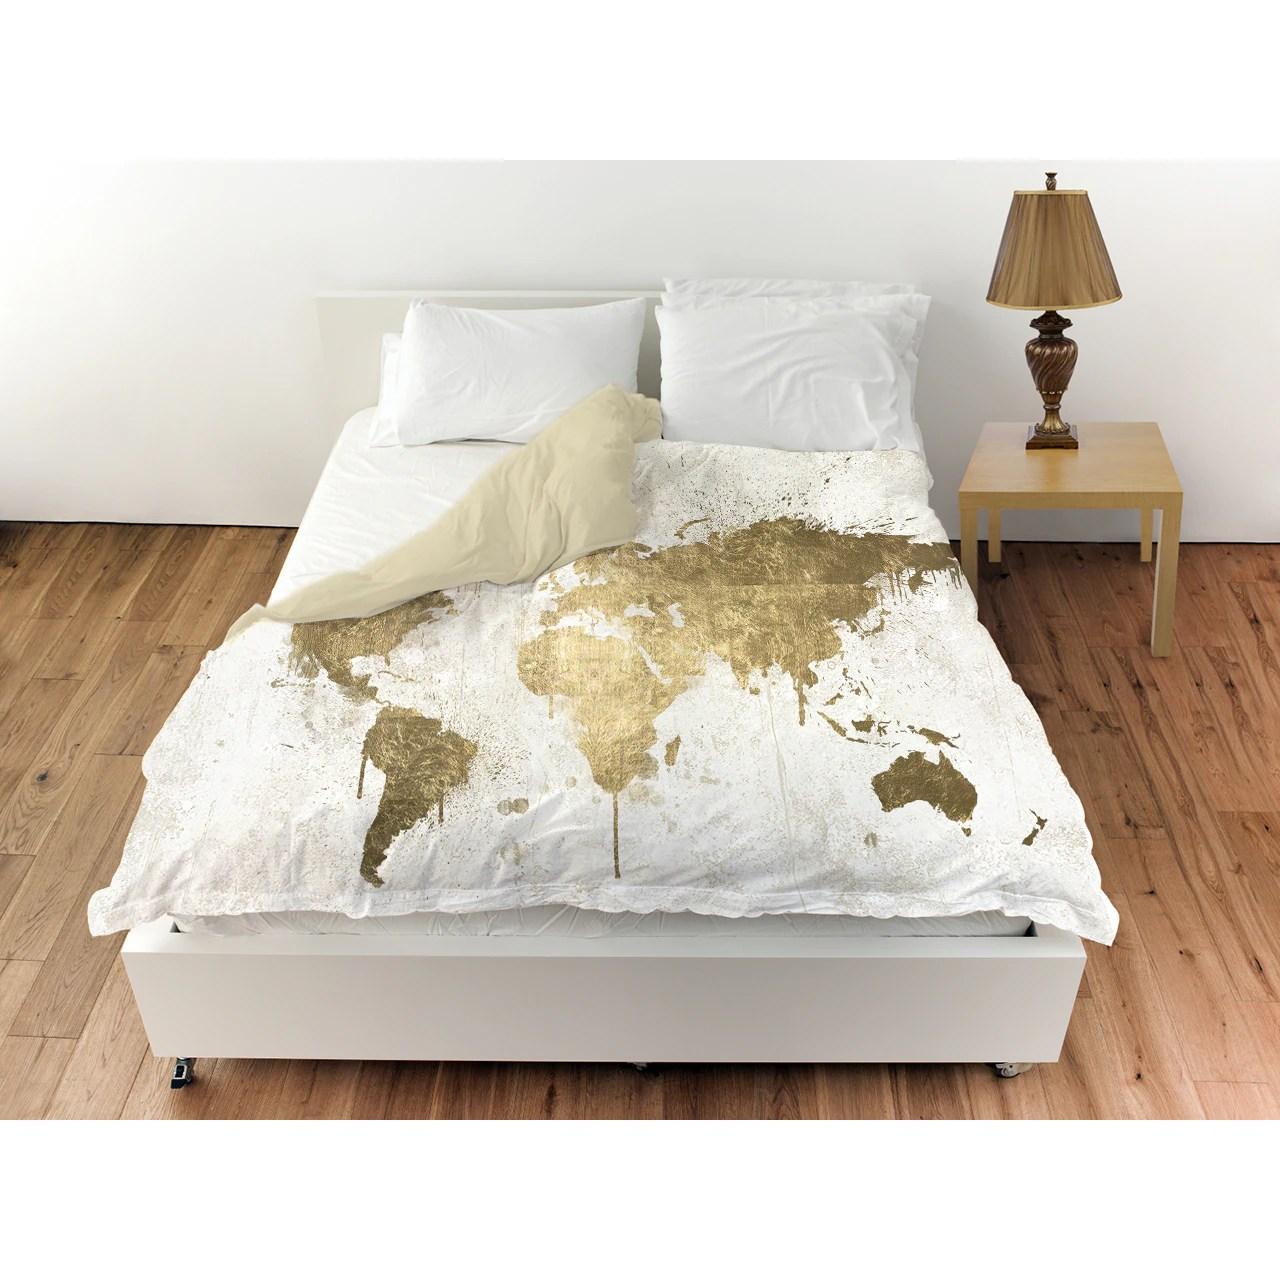 oliver gal mapamundi white gold duvet cover